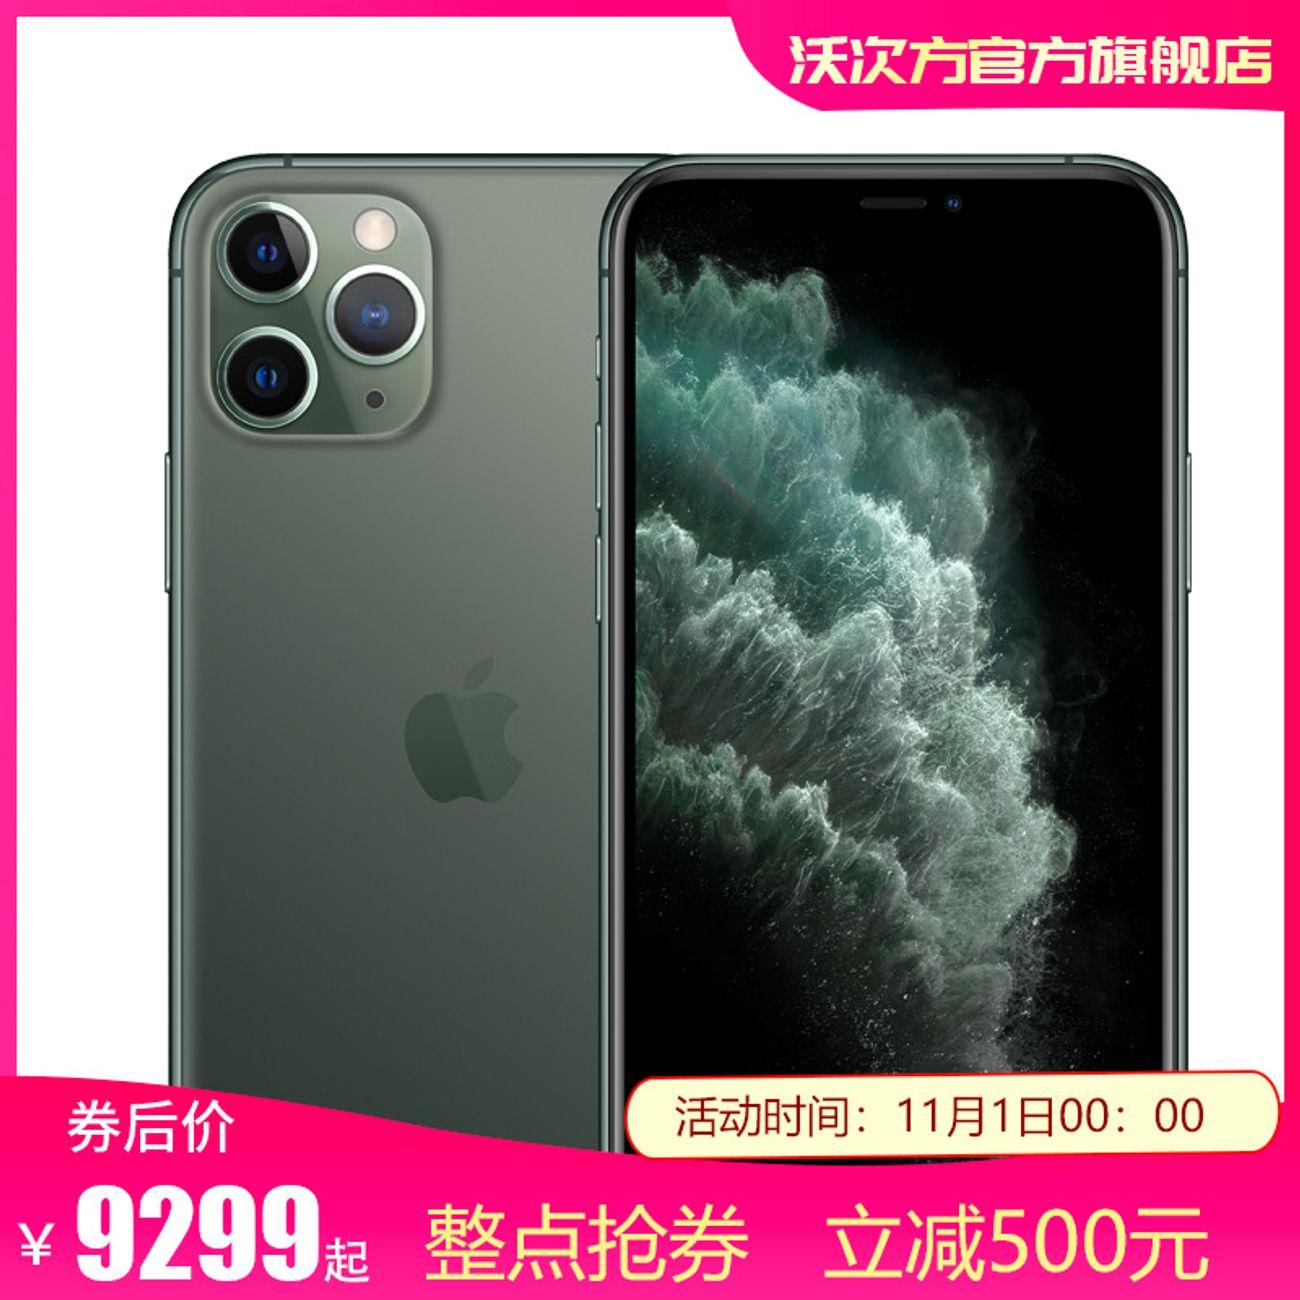 Apple iPhone 11 Pro Max 全网通 苹果手机 256GB 拼多多优惠券折后¥9499包邮